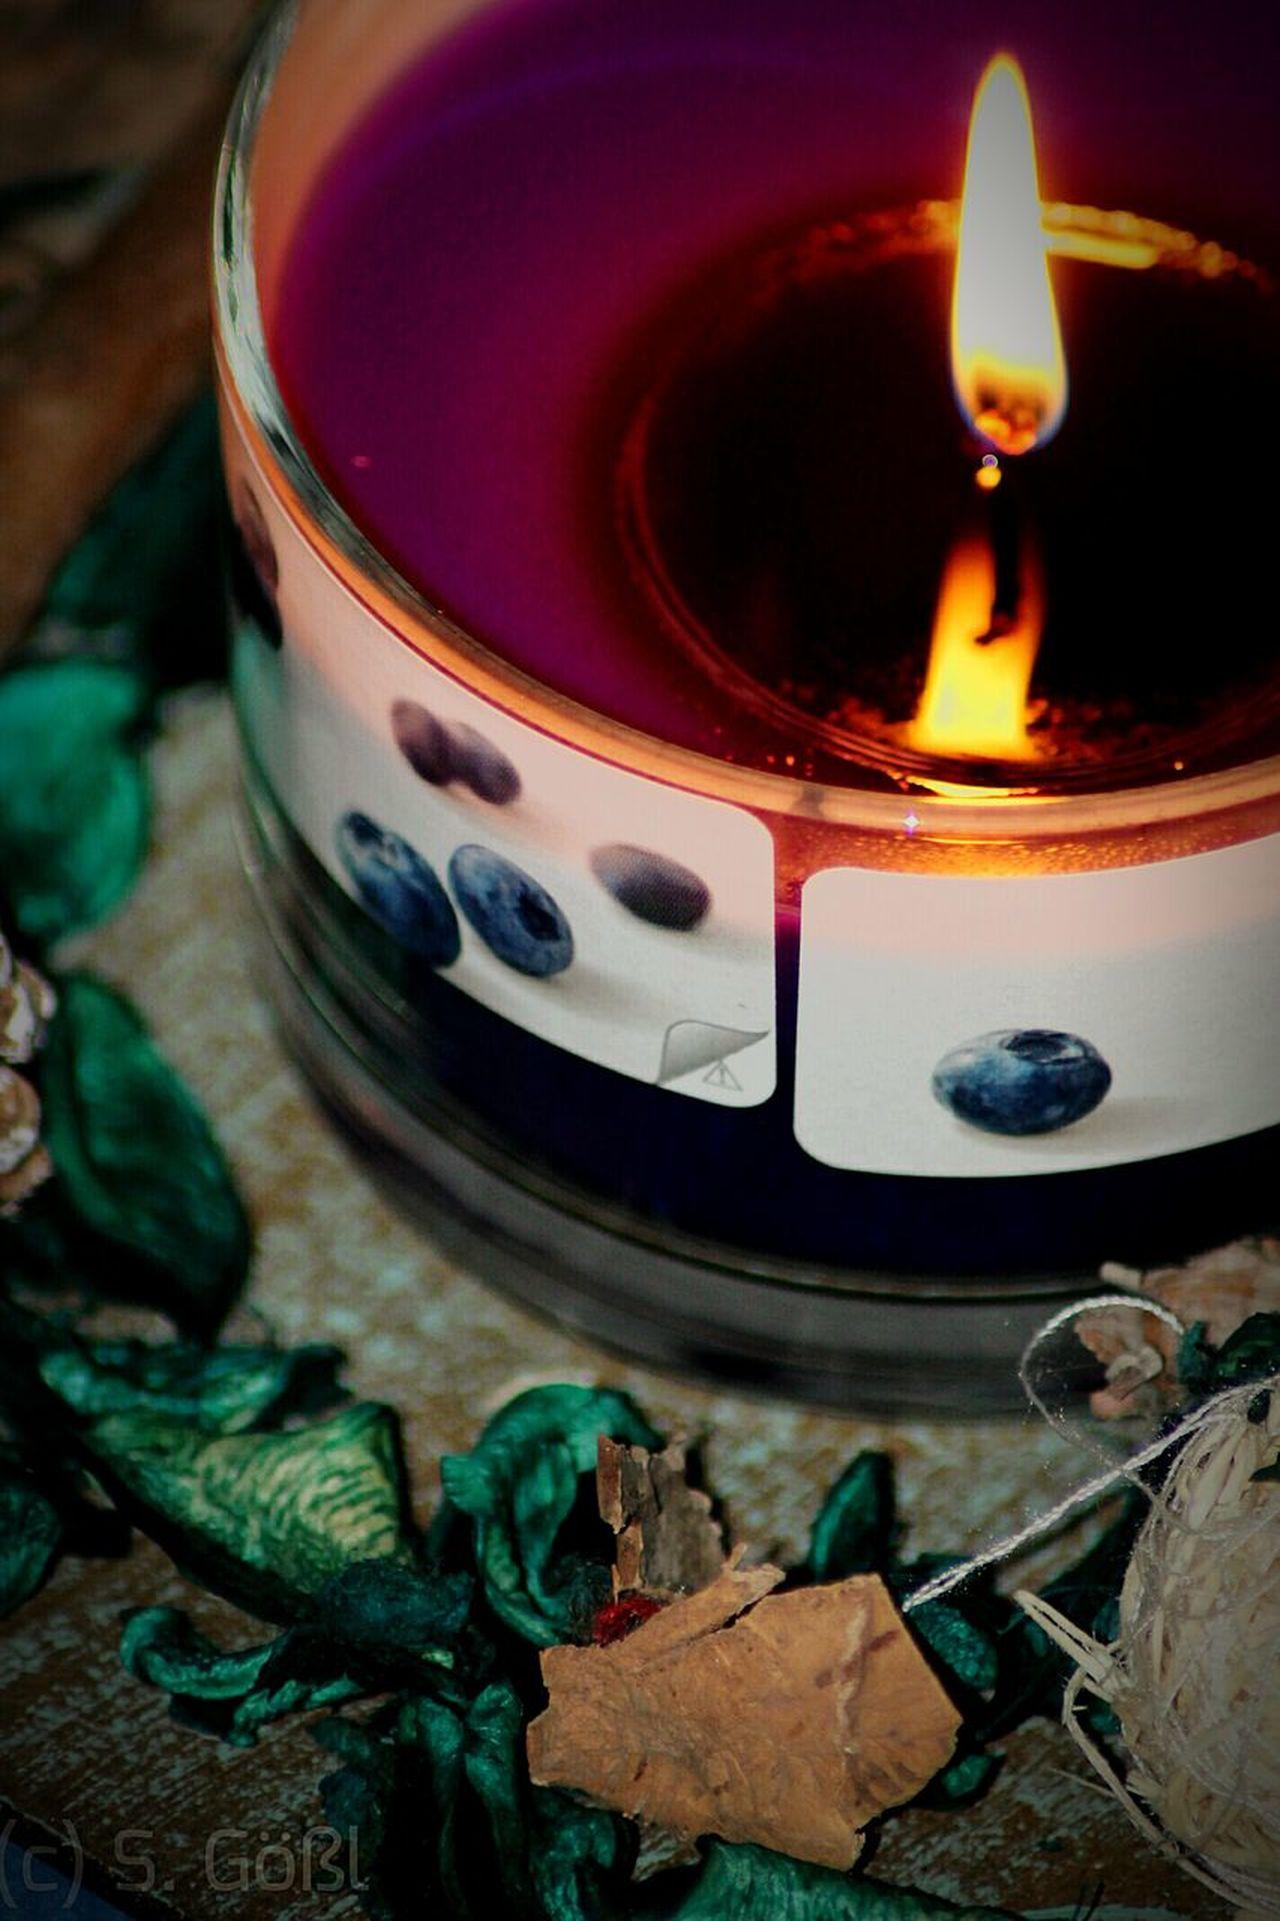 Canon Tamron Candle Candlelight Flame Bolsius Blueberry Decorative Makro Light